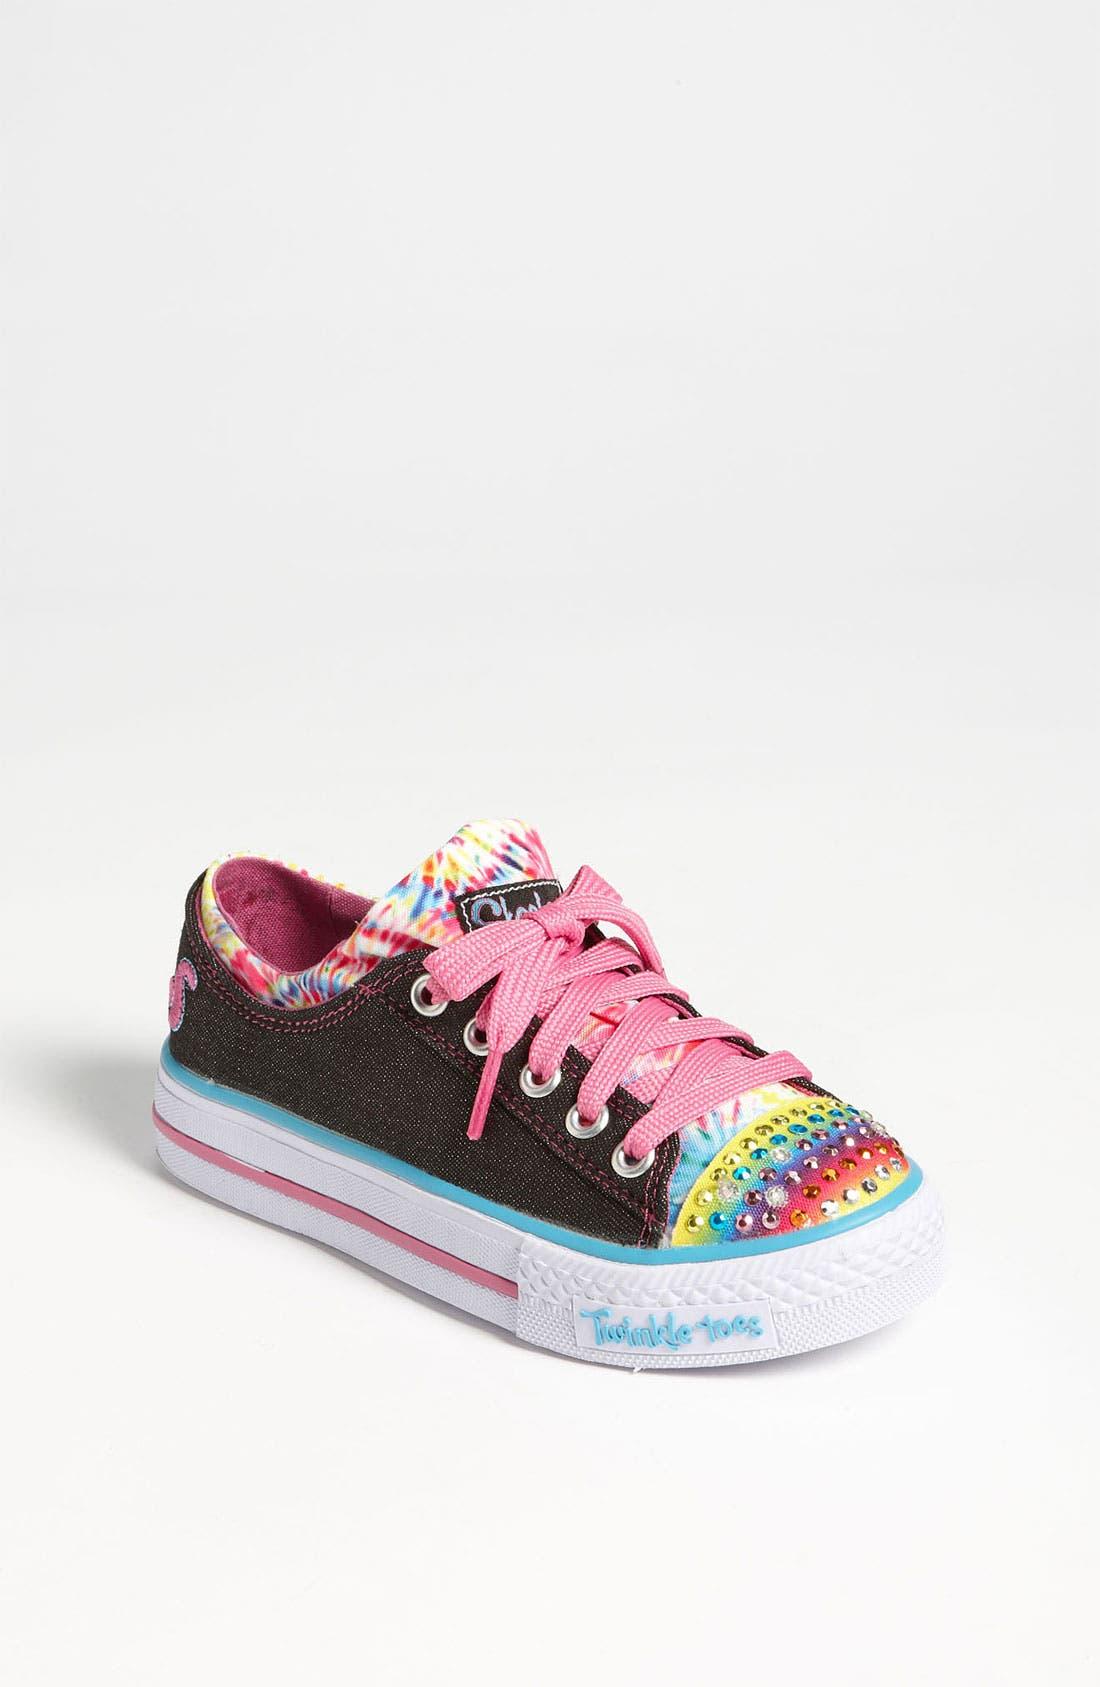 Main Image - SKECHERS 'Shuffle Ups - Much Love' Sneaker (Toddler & Little Kid)